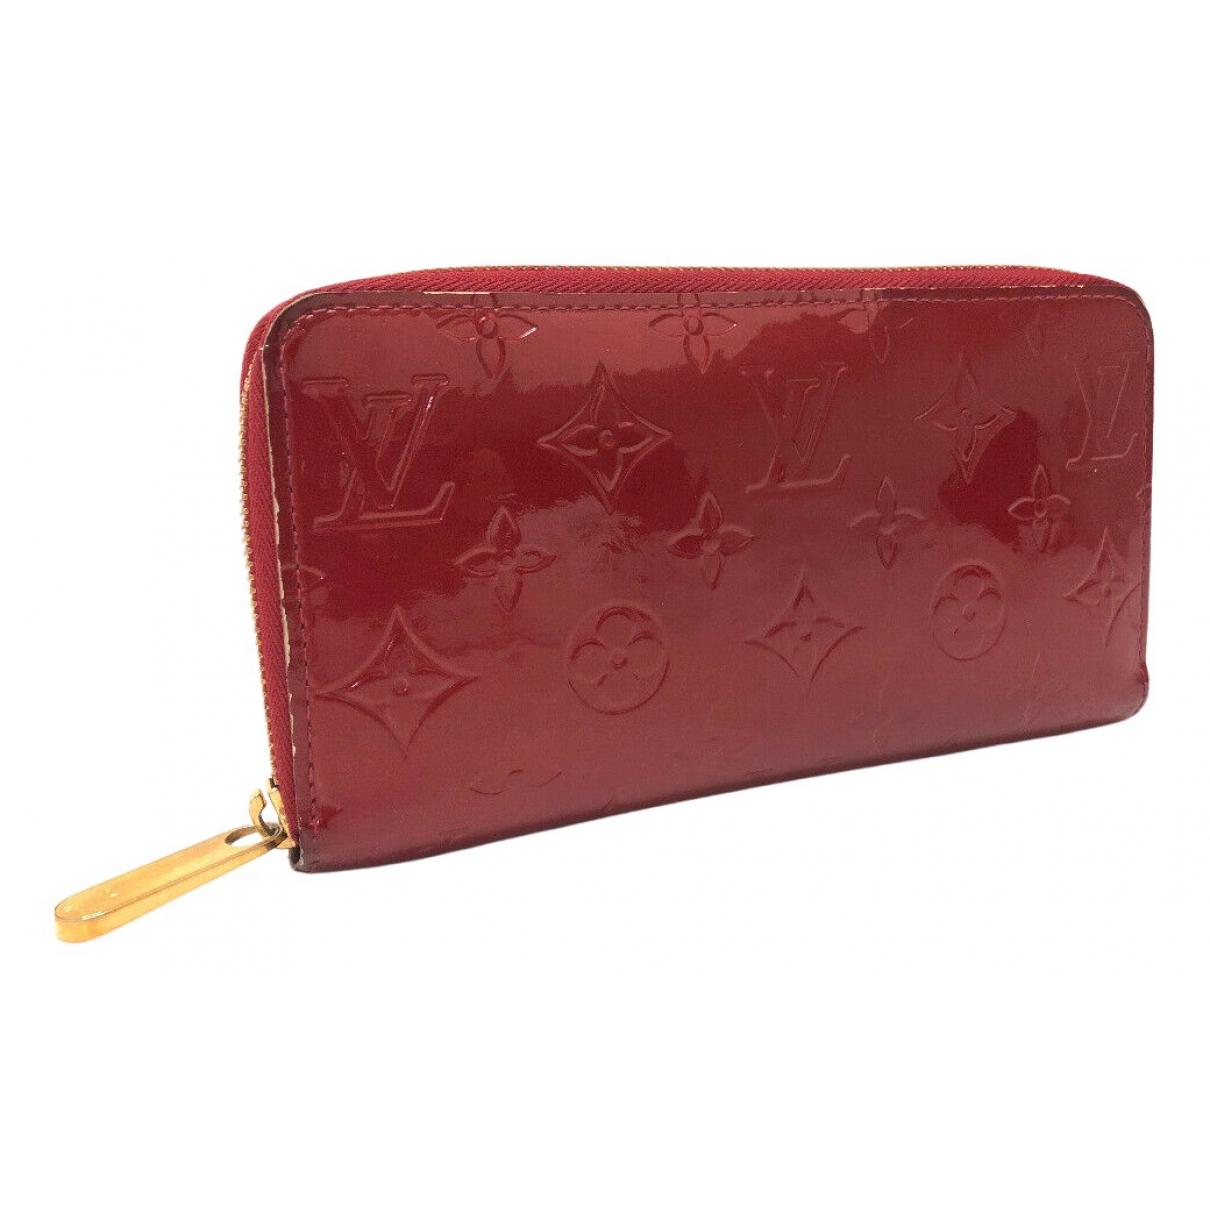 Louis Vuitton Zippy Portemonnaie in  Rot Lackleder